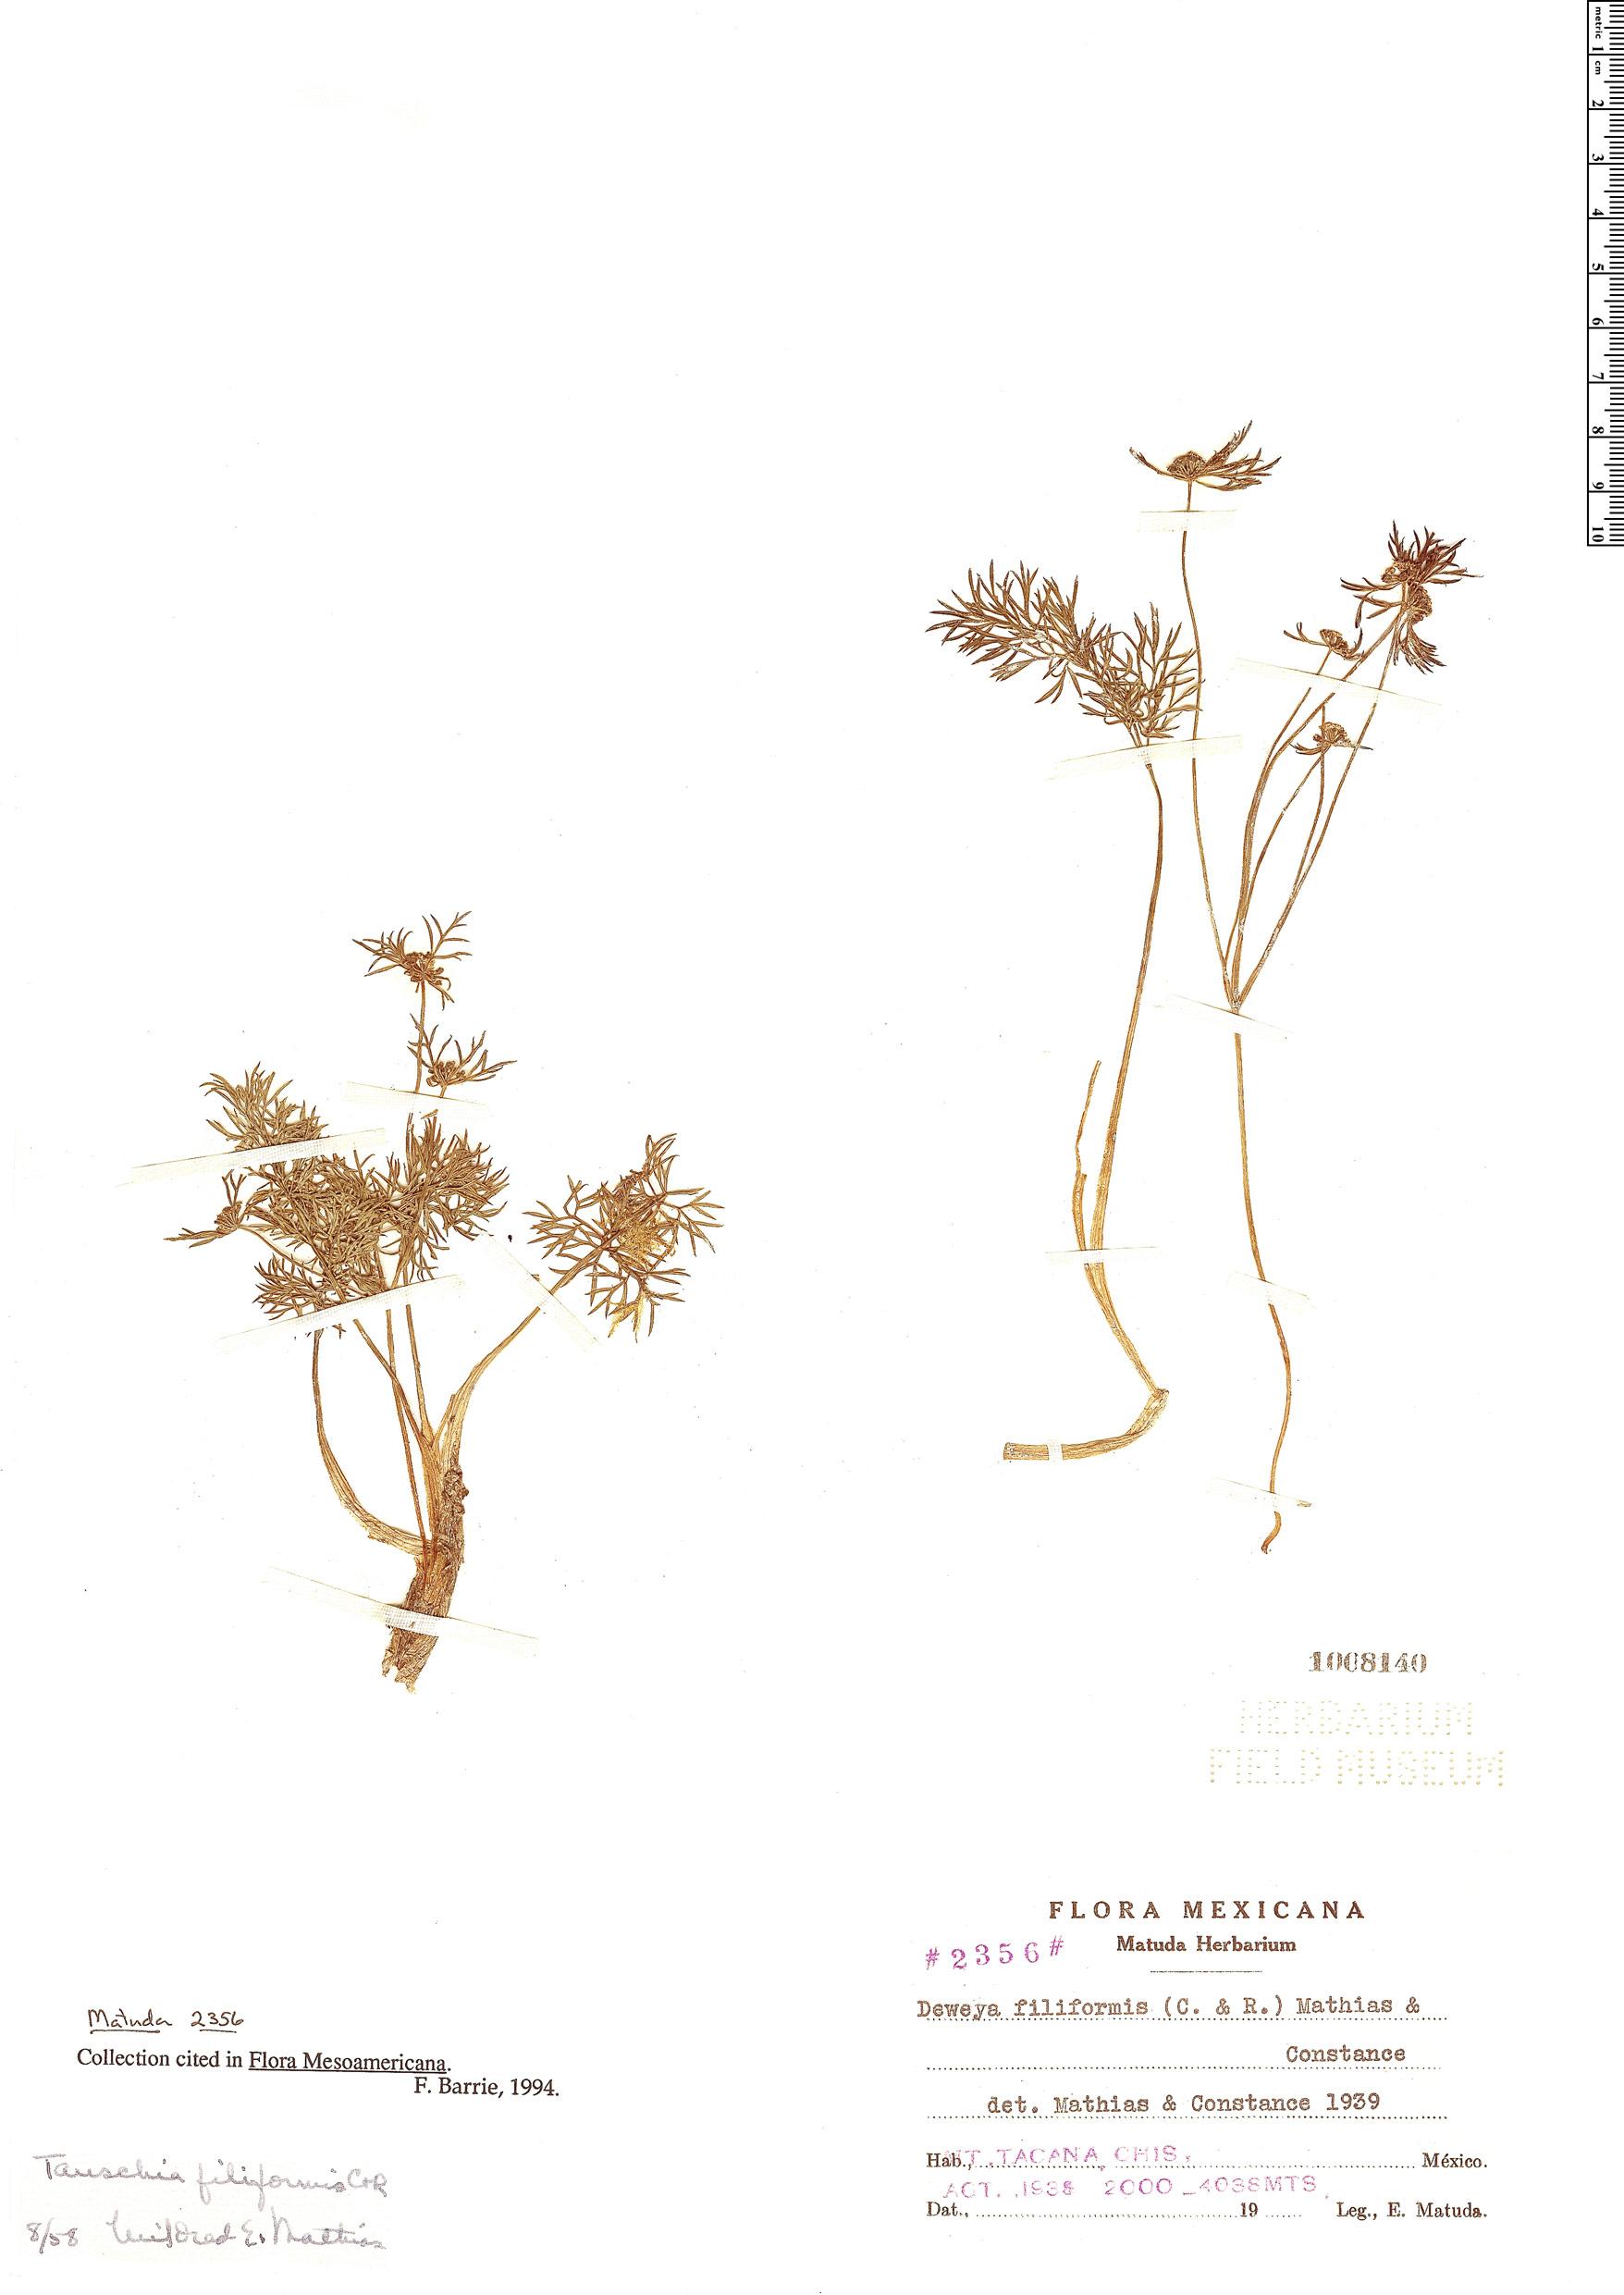 Espécimen: Tauschia filiformis